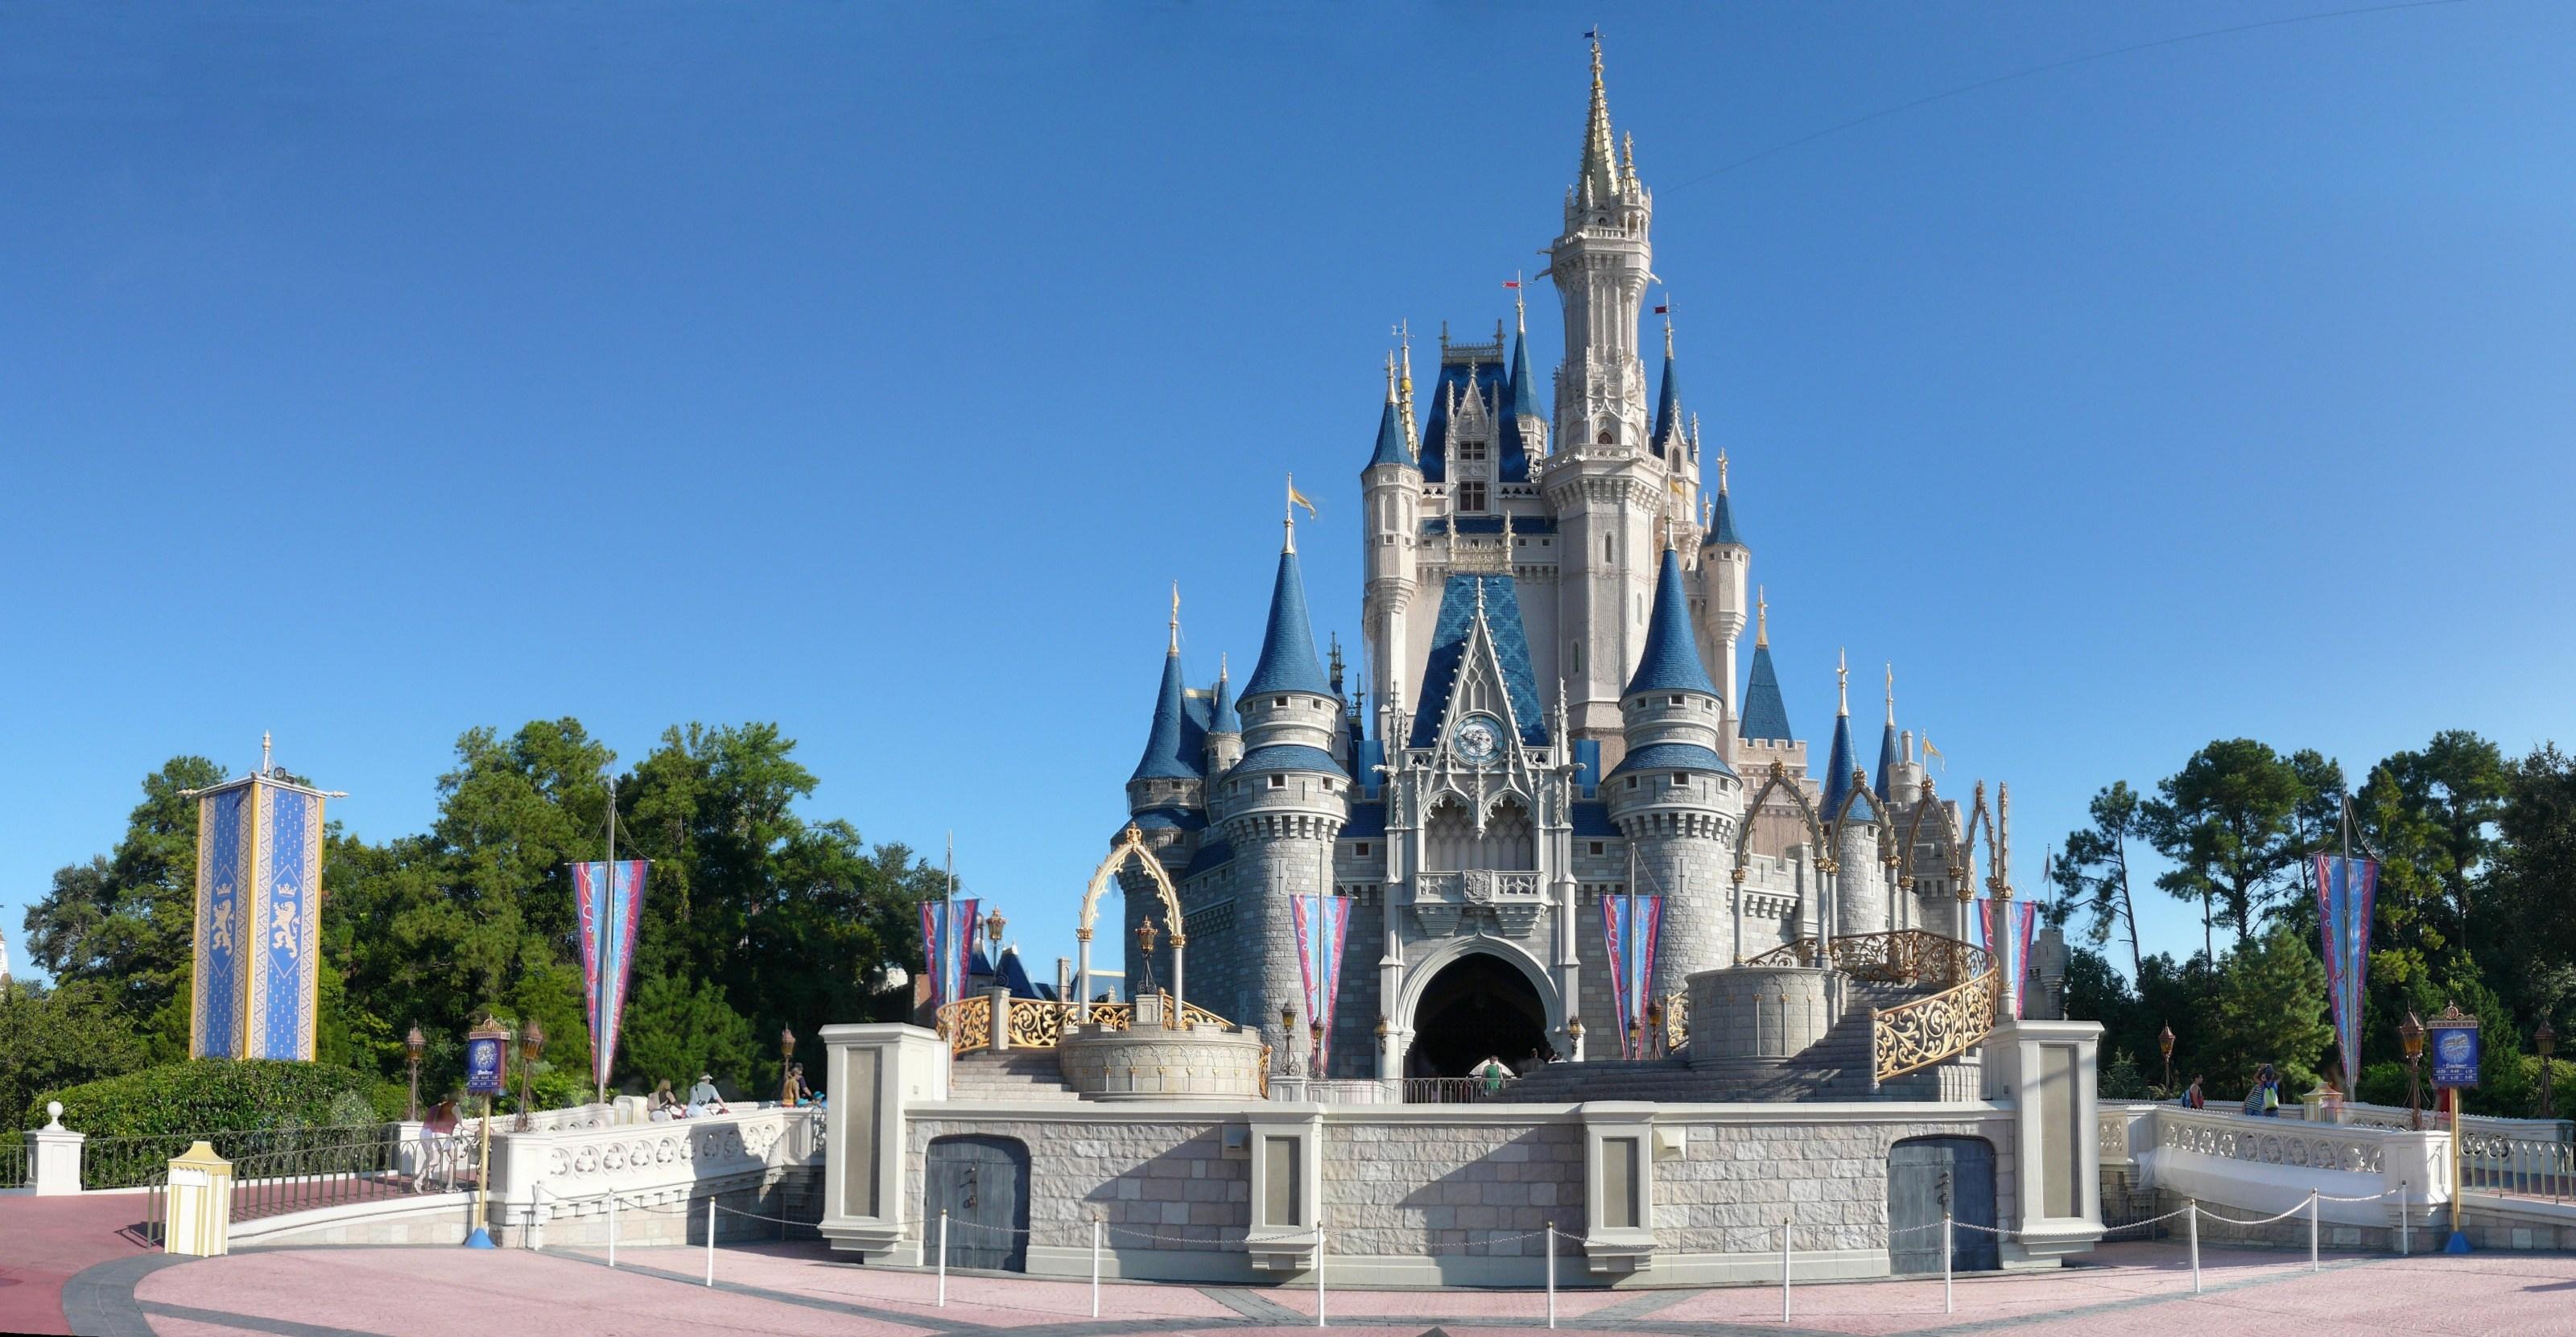 Castle clipart cinderella castle. Disney world ww fn